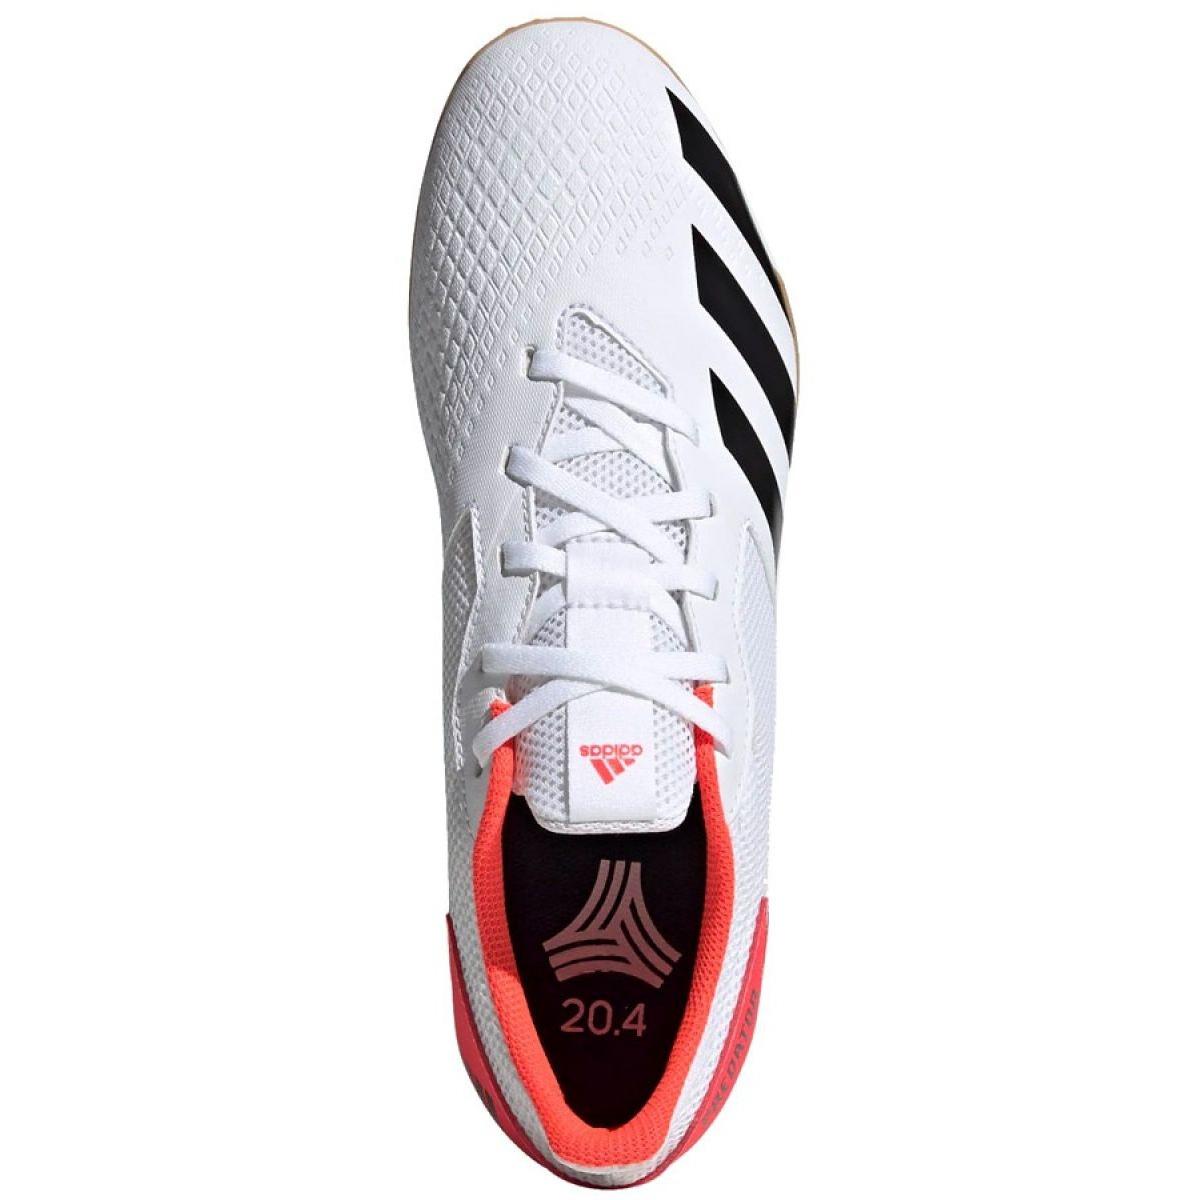 Buty halowe adidas Predator 20.4 In Sala M EG0926 białe wielokolorowe